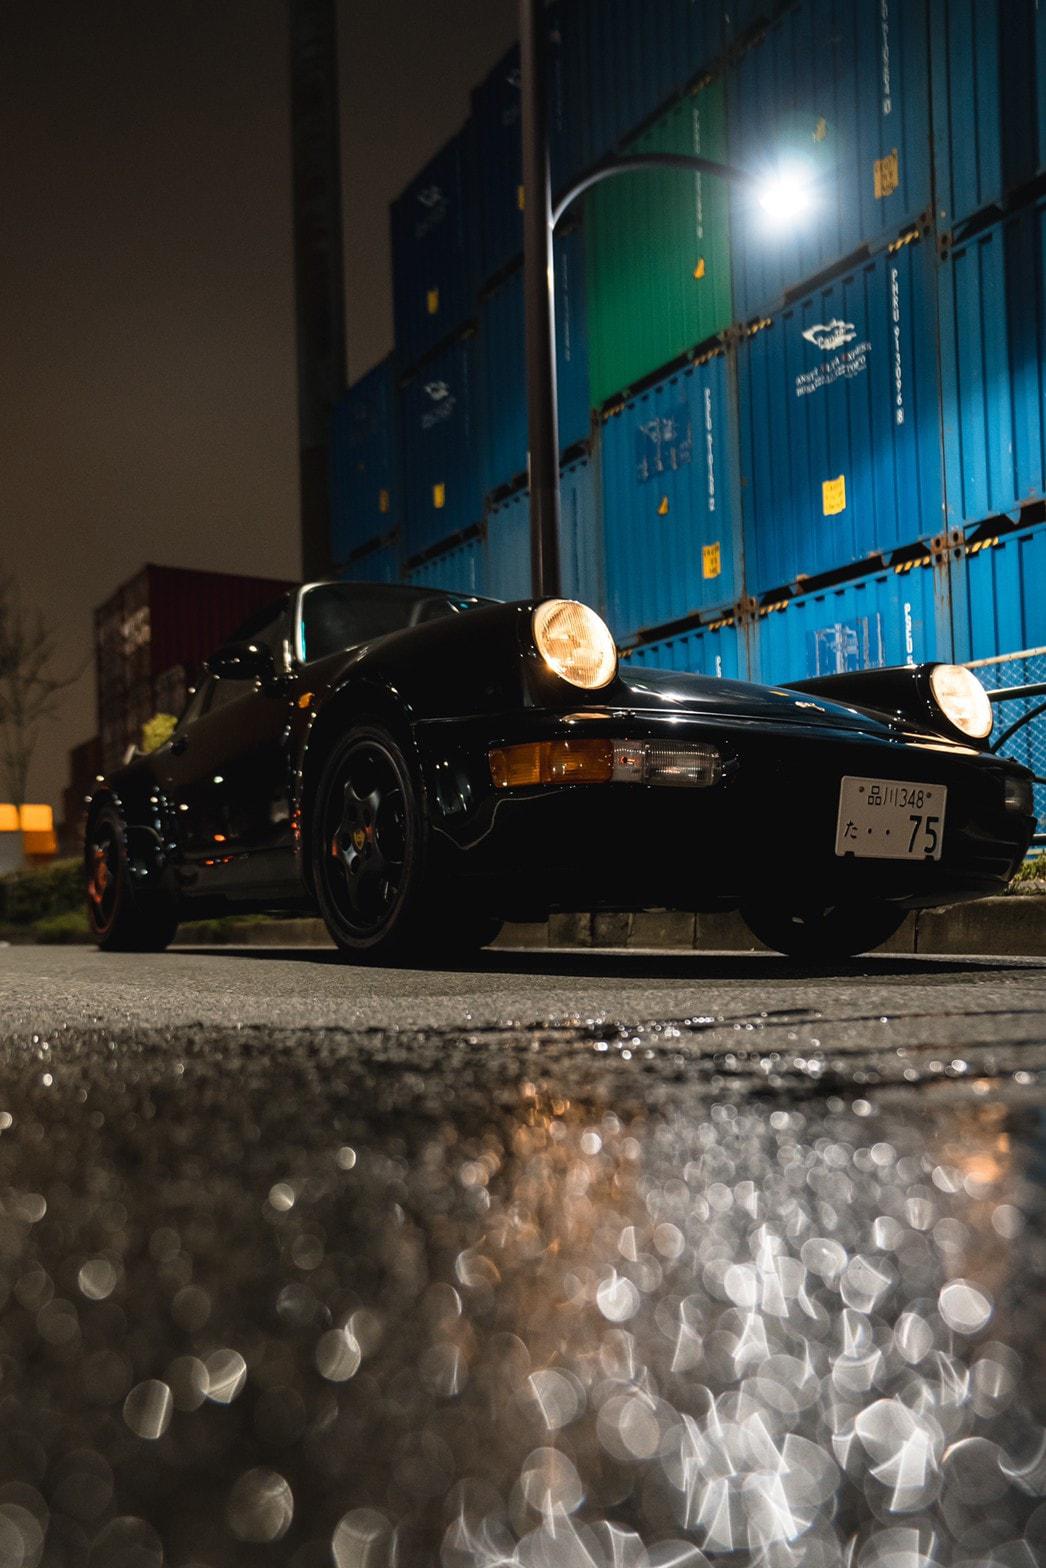 Ryo Ishikawa of FR2 and His Porsche 911 Turbo 964 Drivers Feature 1992 Air Cooled Rear Engined Gundam Zaku